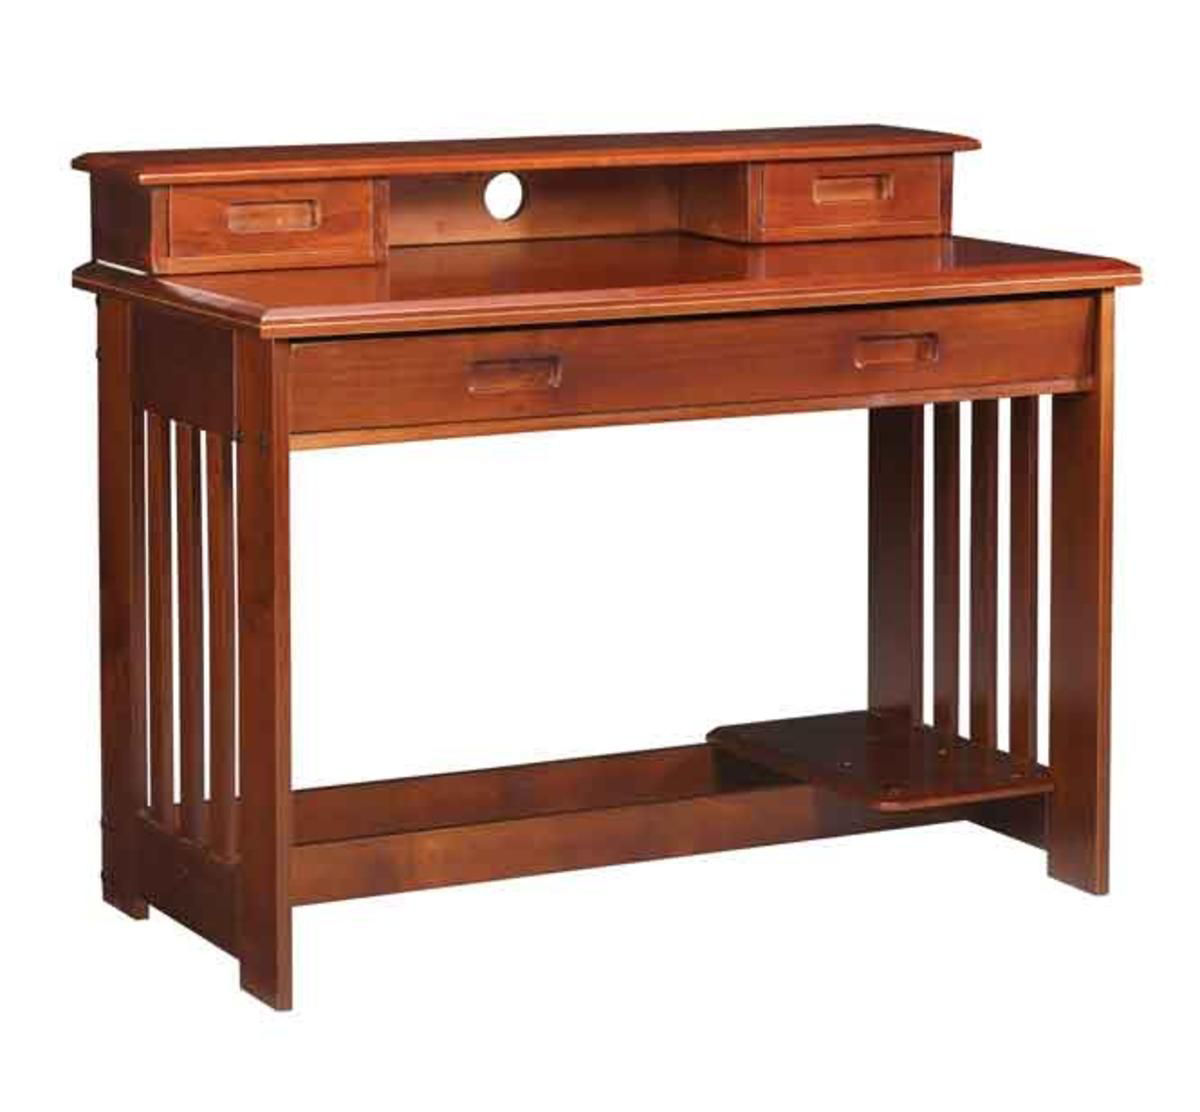 Picture of Forrester Desk & Hutch